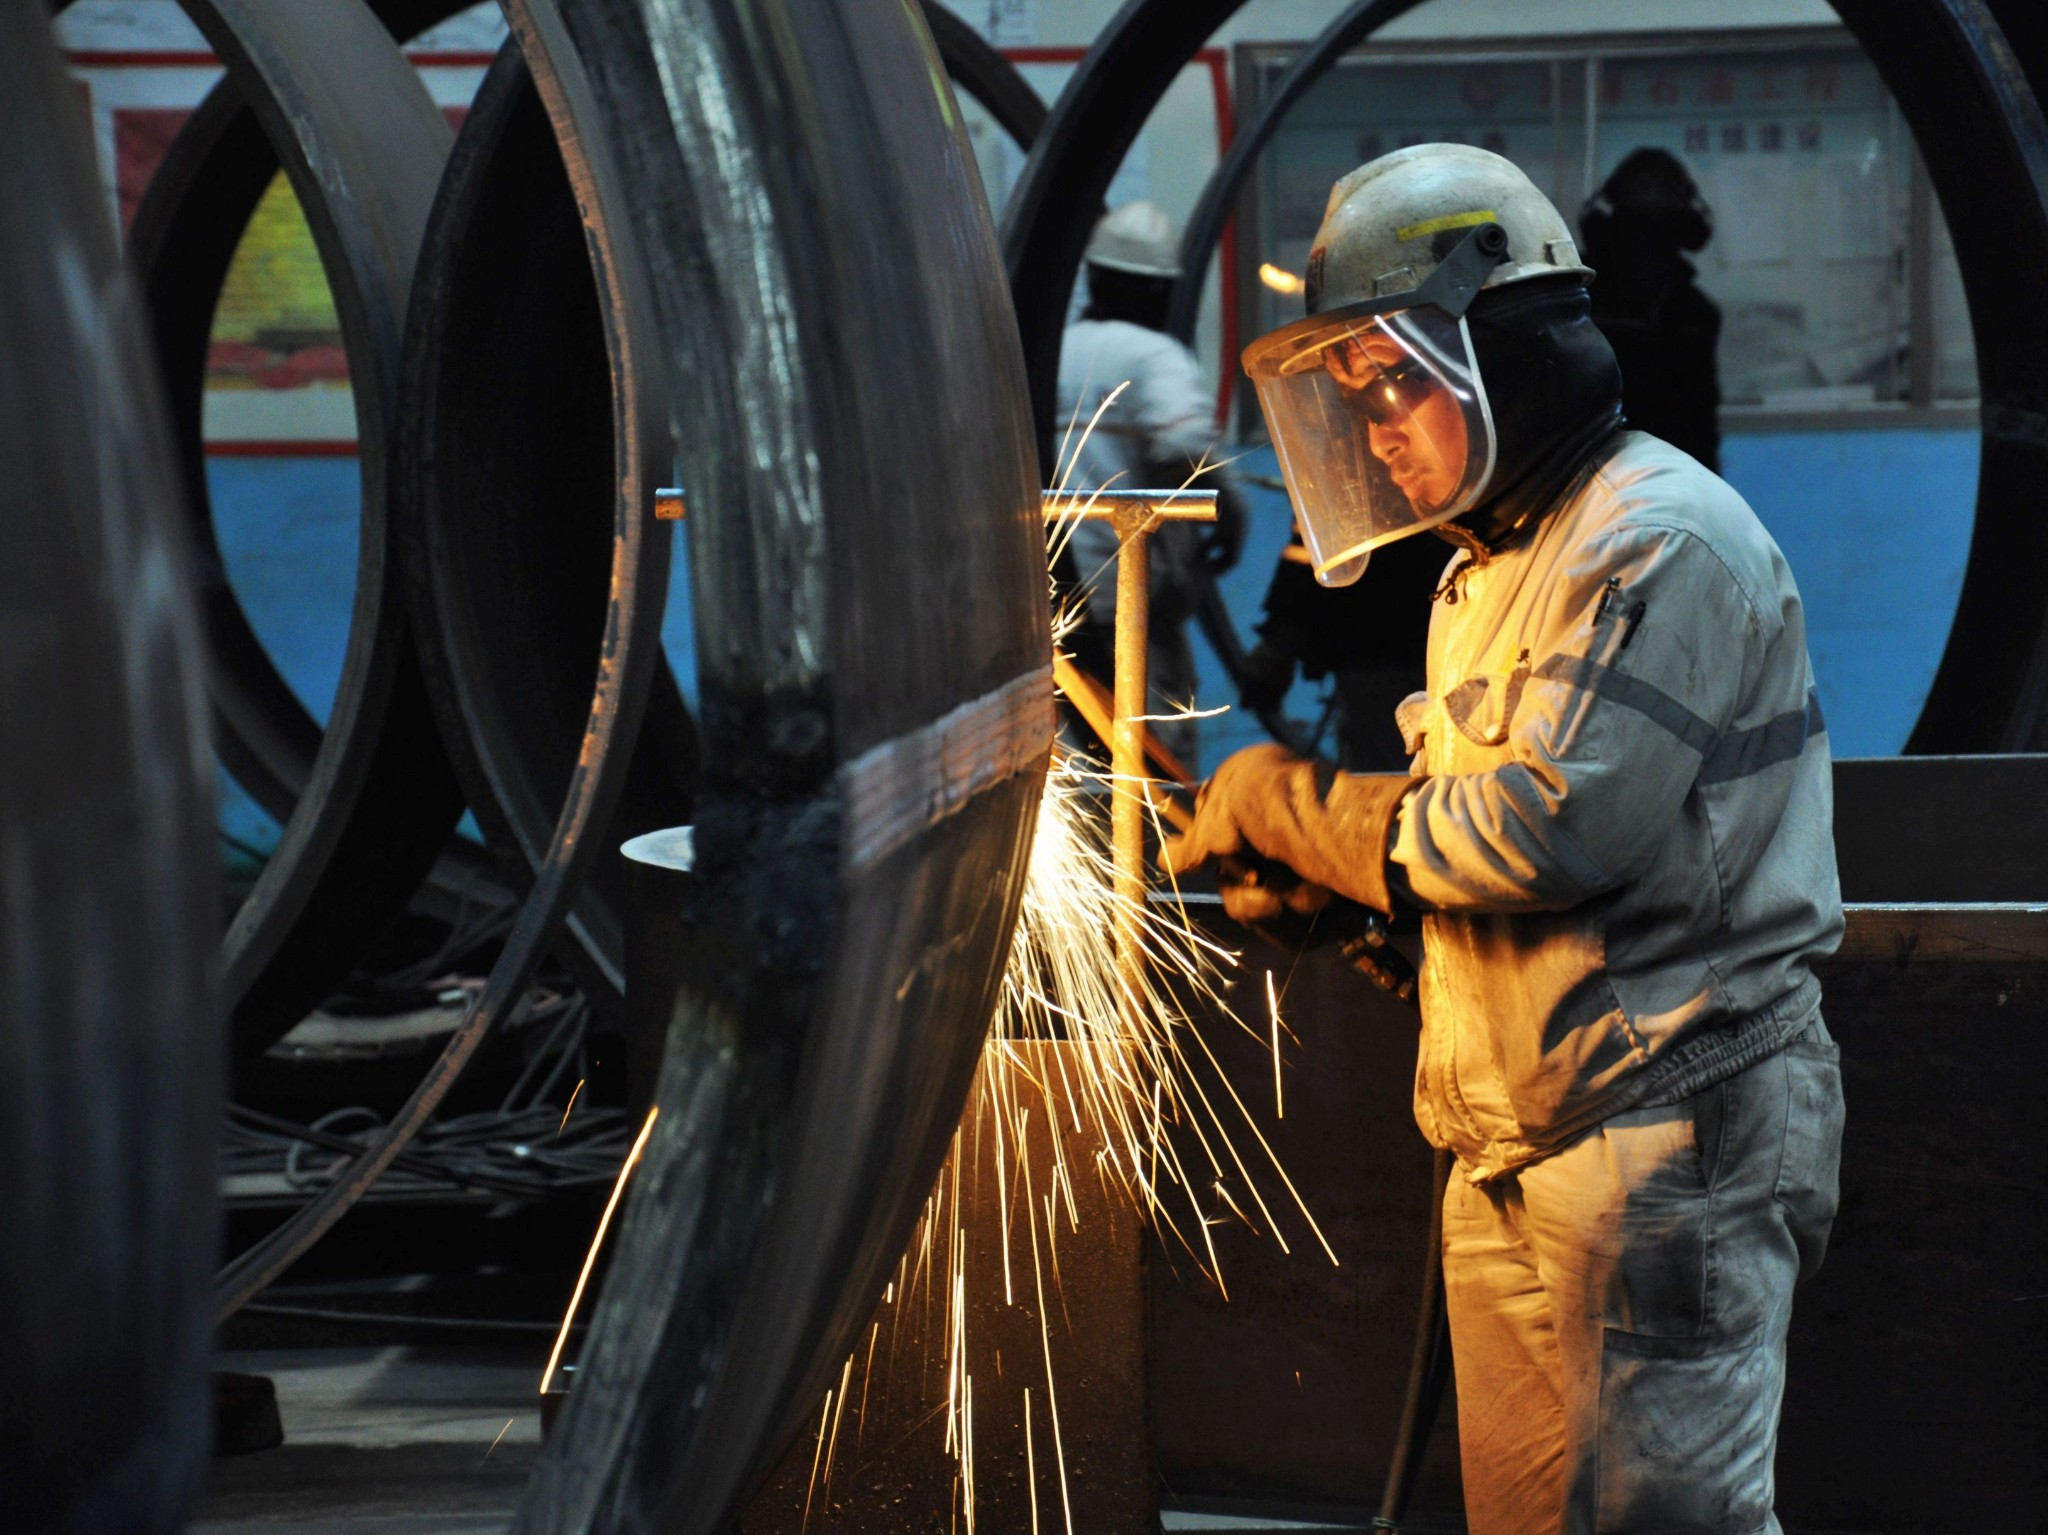 Trump Says He Plans To Impose Tariffs On Steel, Aluminum Imports